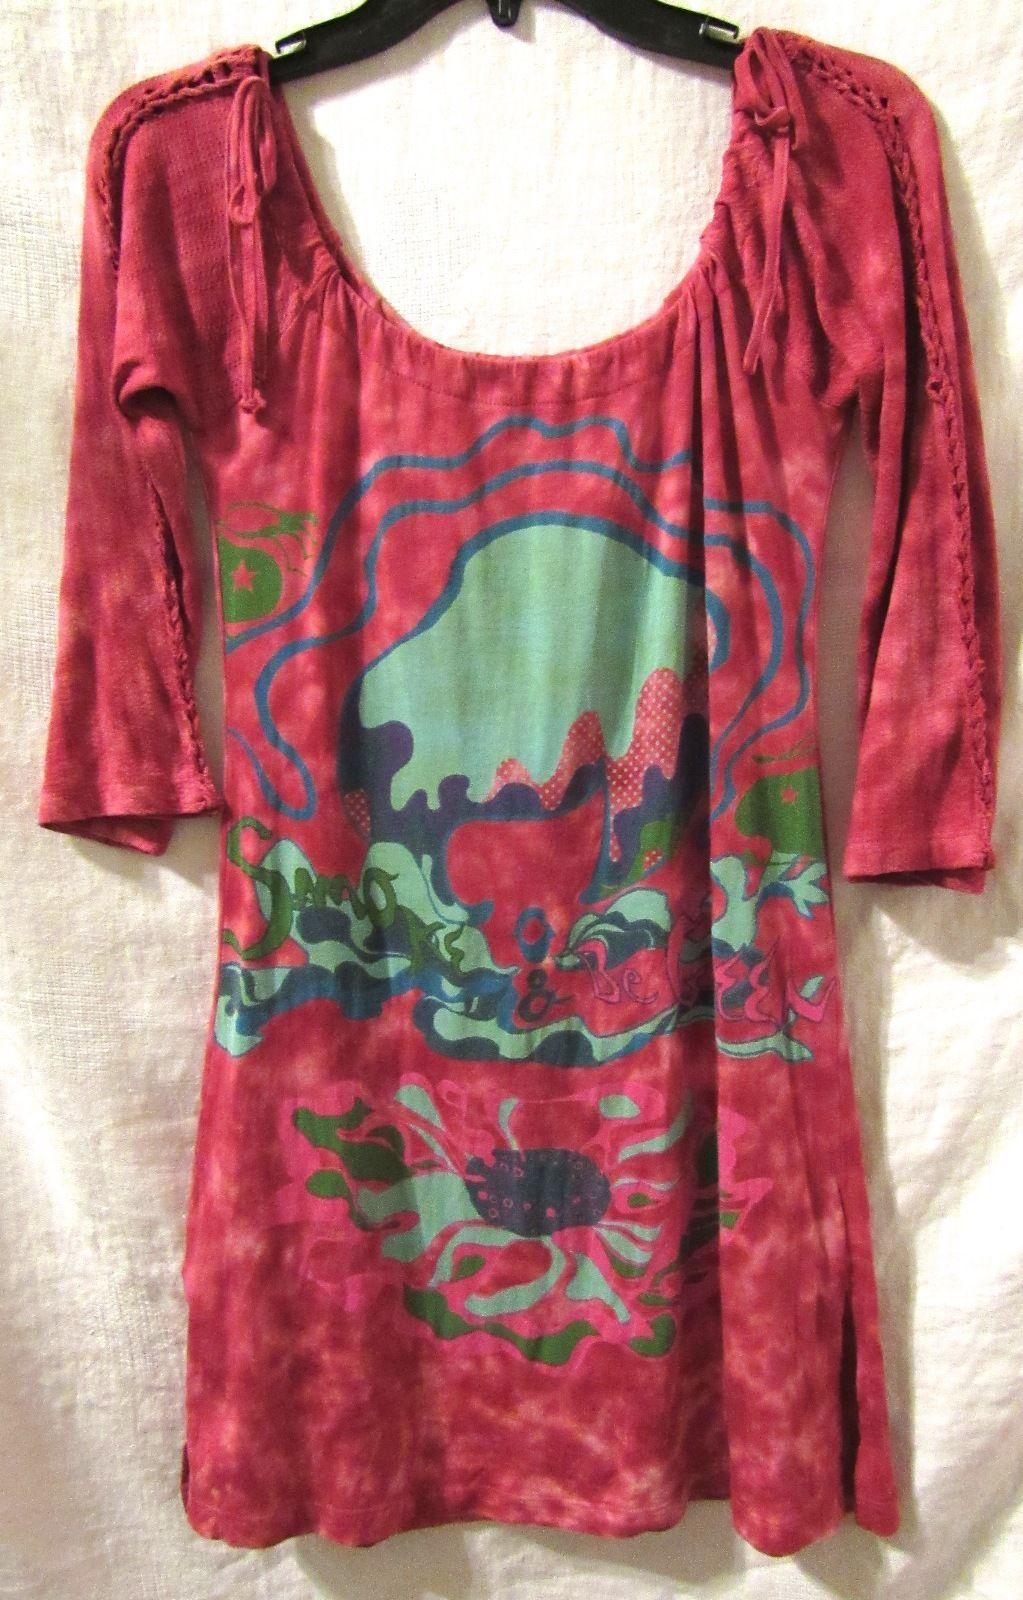 Custo Barcelona Clothing Cotton Printed Tie Dye Dress/Tunic Top 3/4 Sleeve S: 2